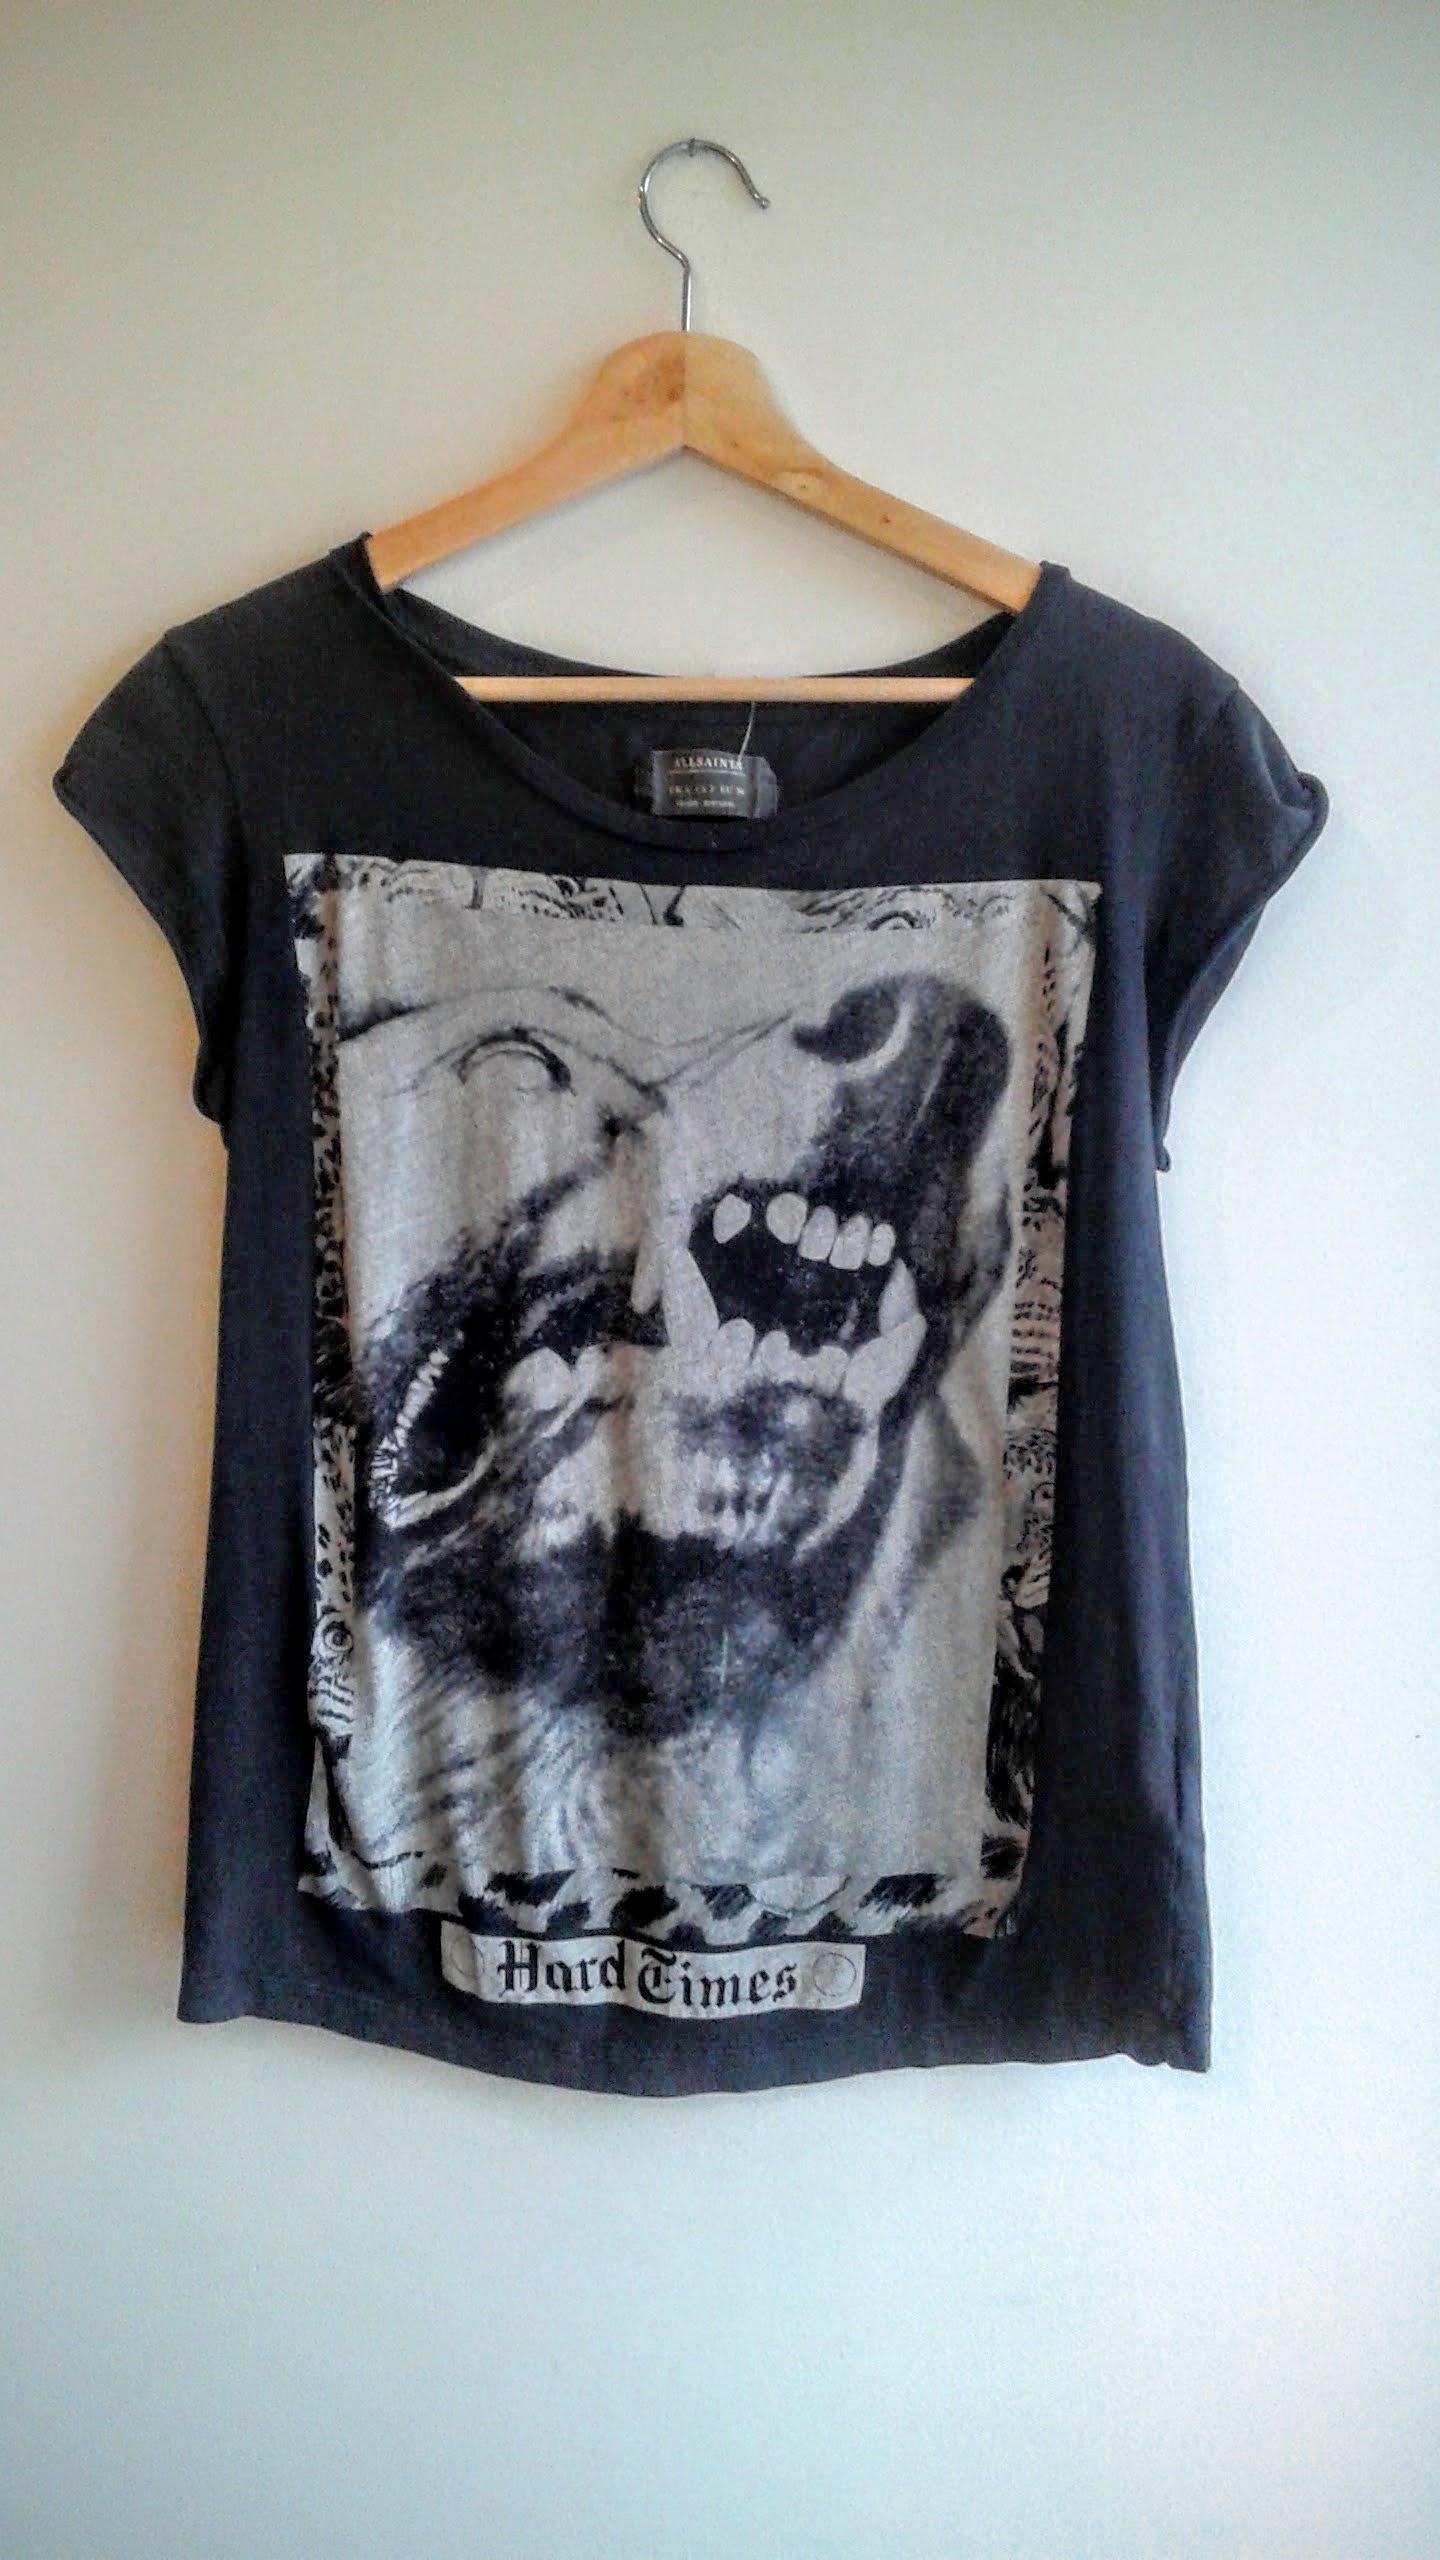 All Saint t-shirt; Size S, $30